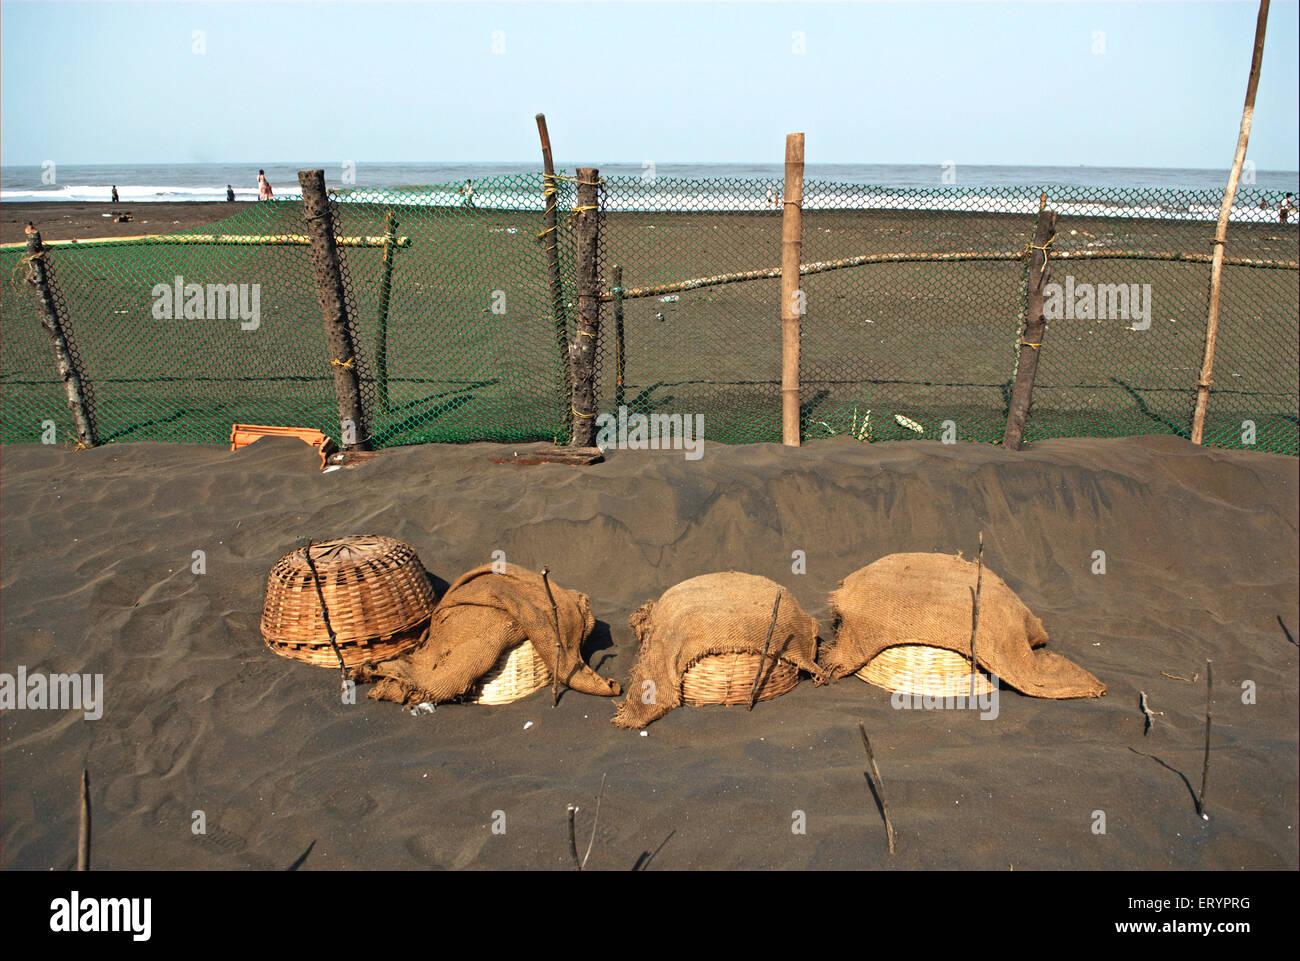 Olive turtle eggs buried under sand for hatching in coasTaj village Velas Ratnagiri  ; Maharashtra  ; India 26 April - Stock Image